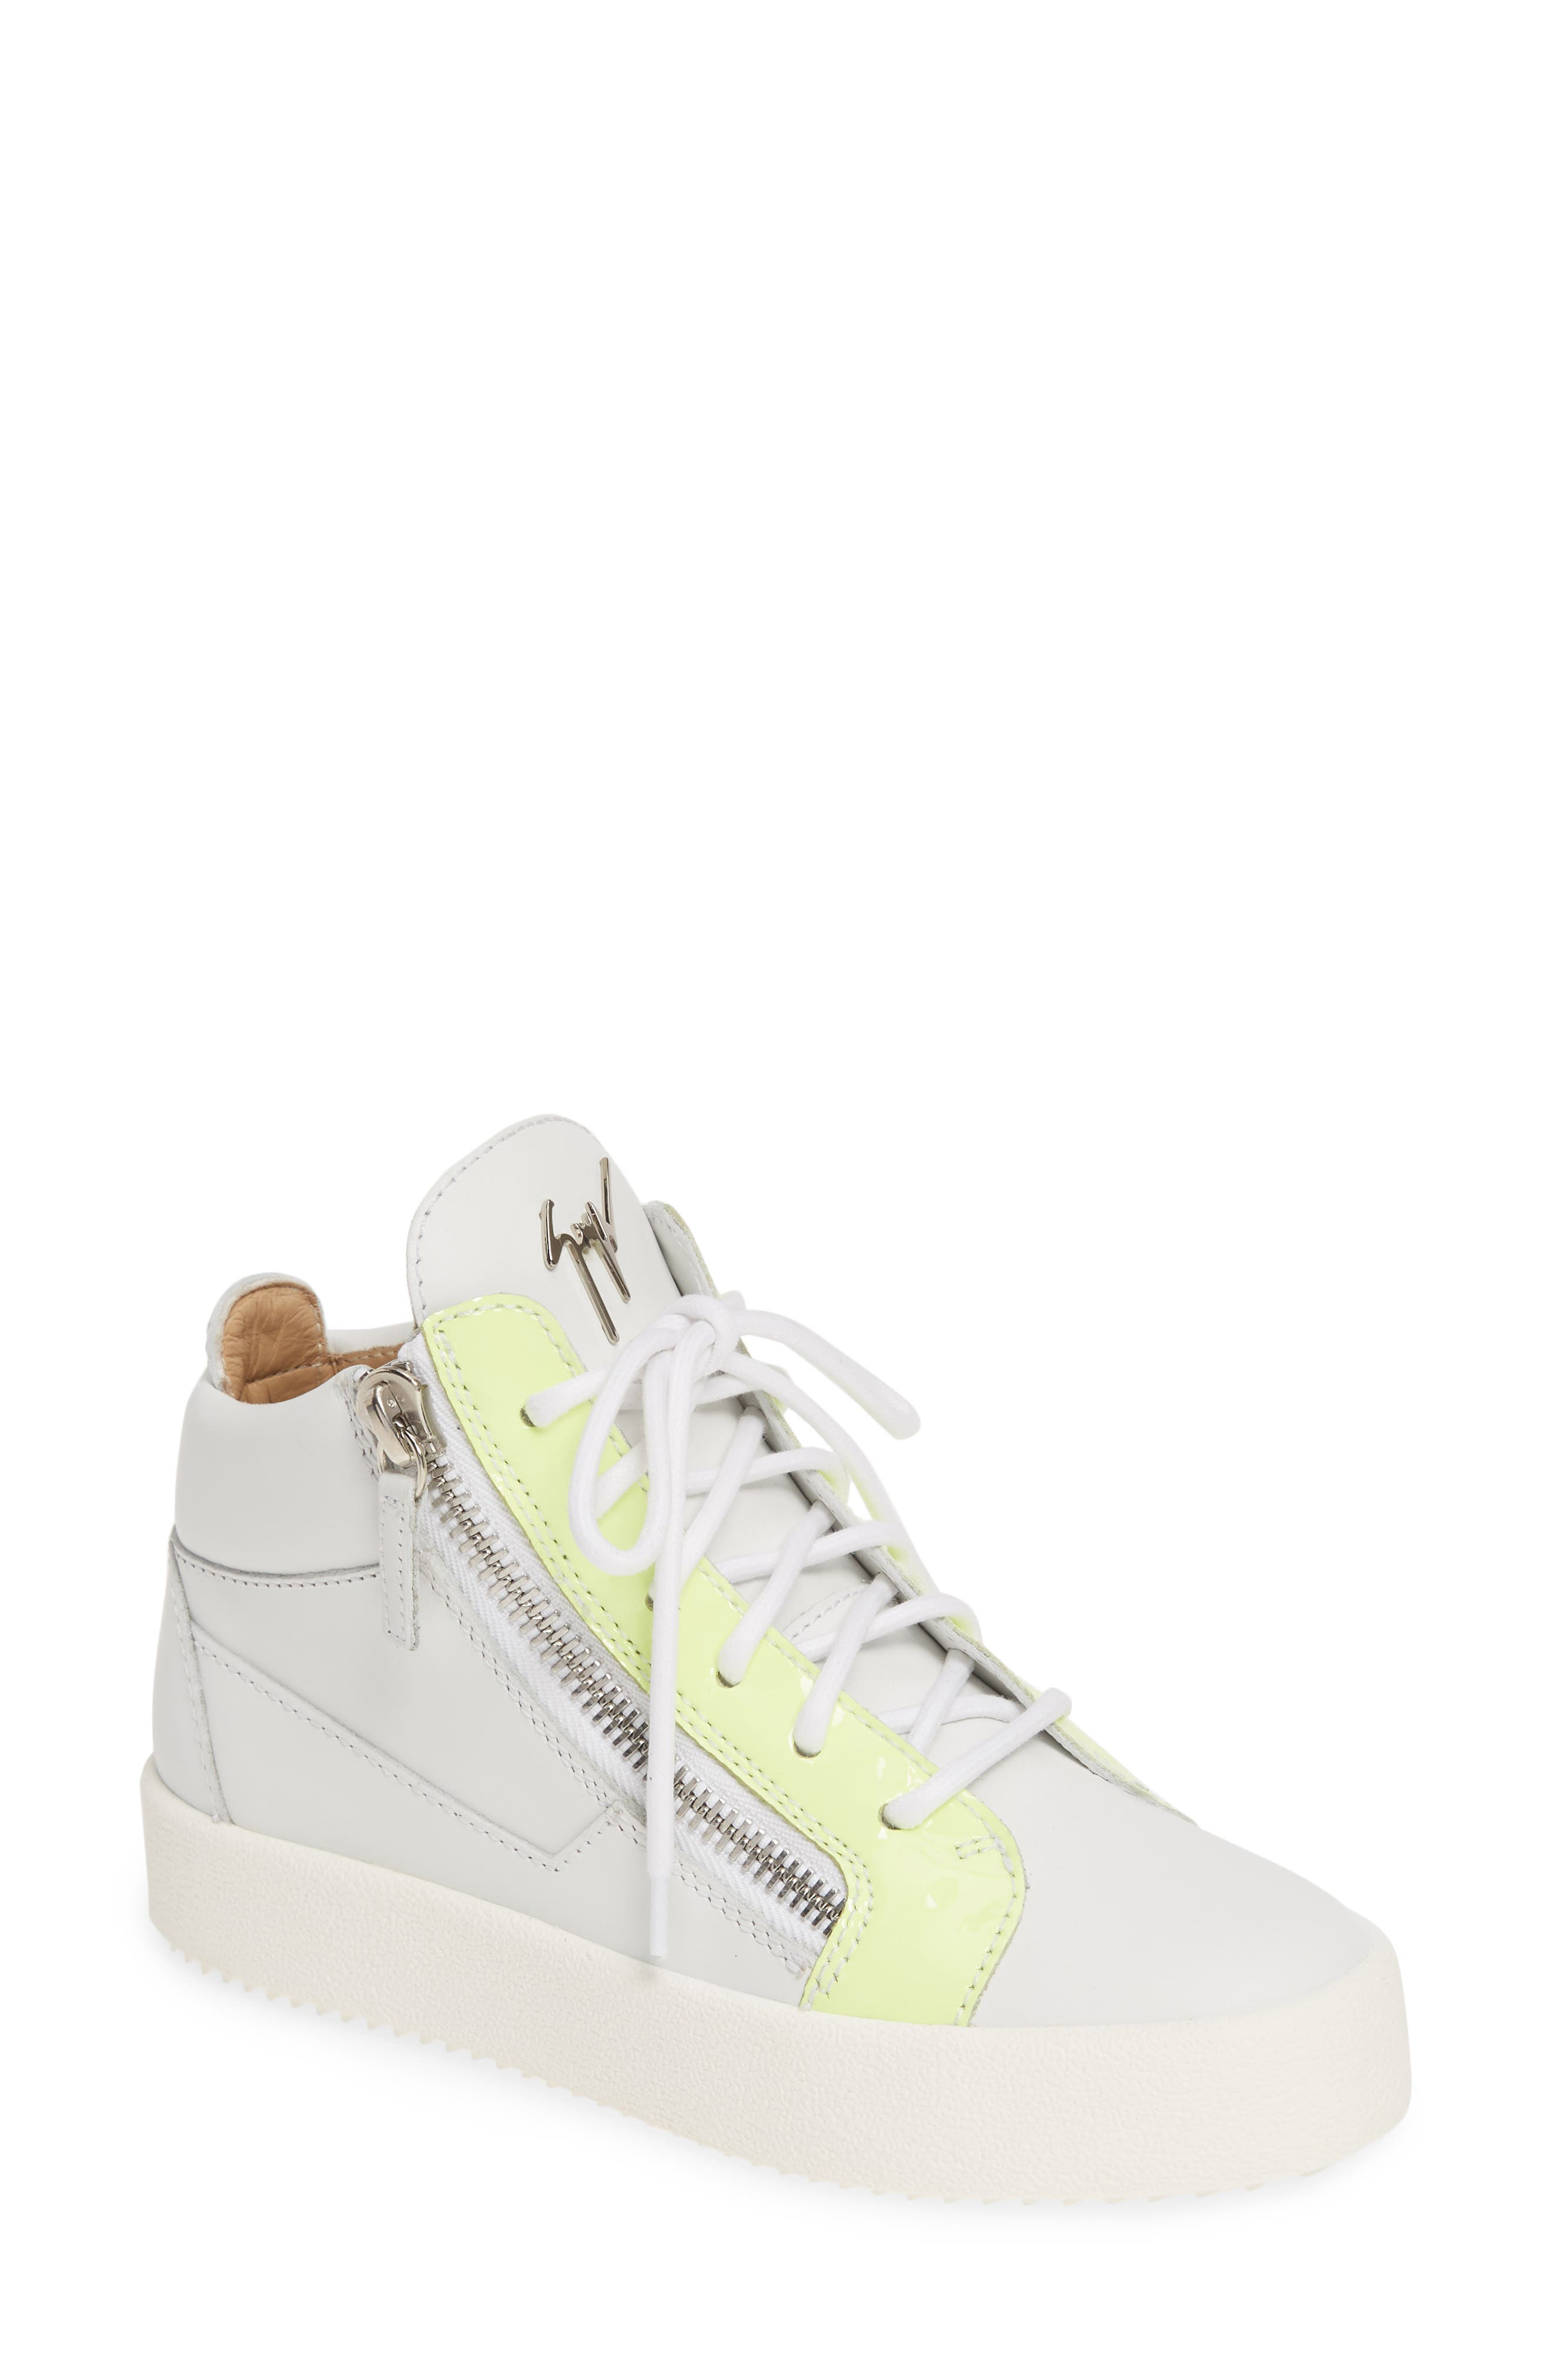 Giuseppe Zanotti May London Mid Top Sneaker- White